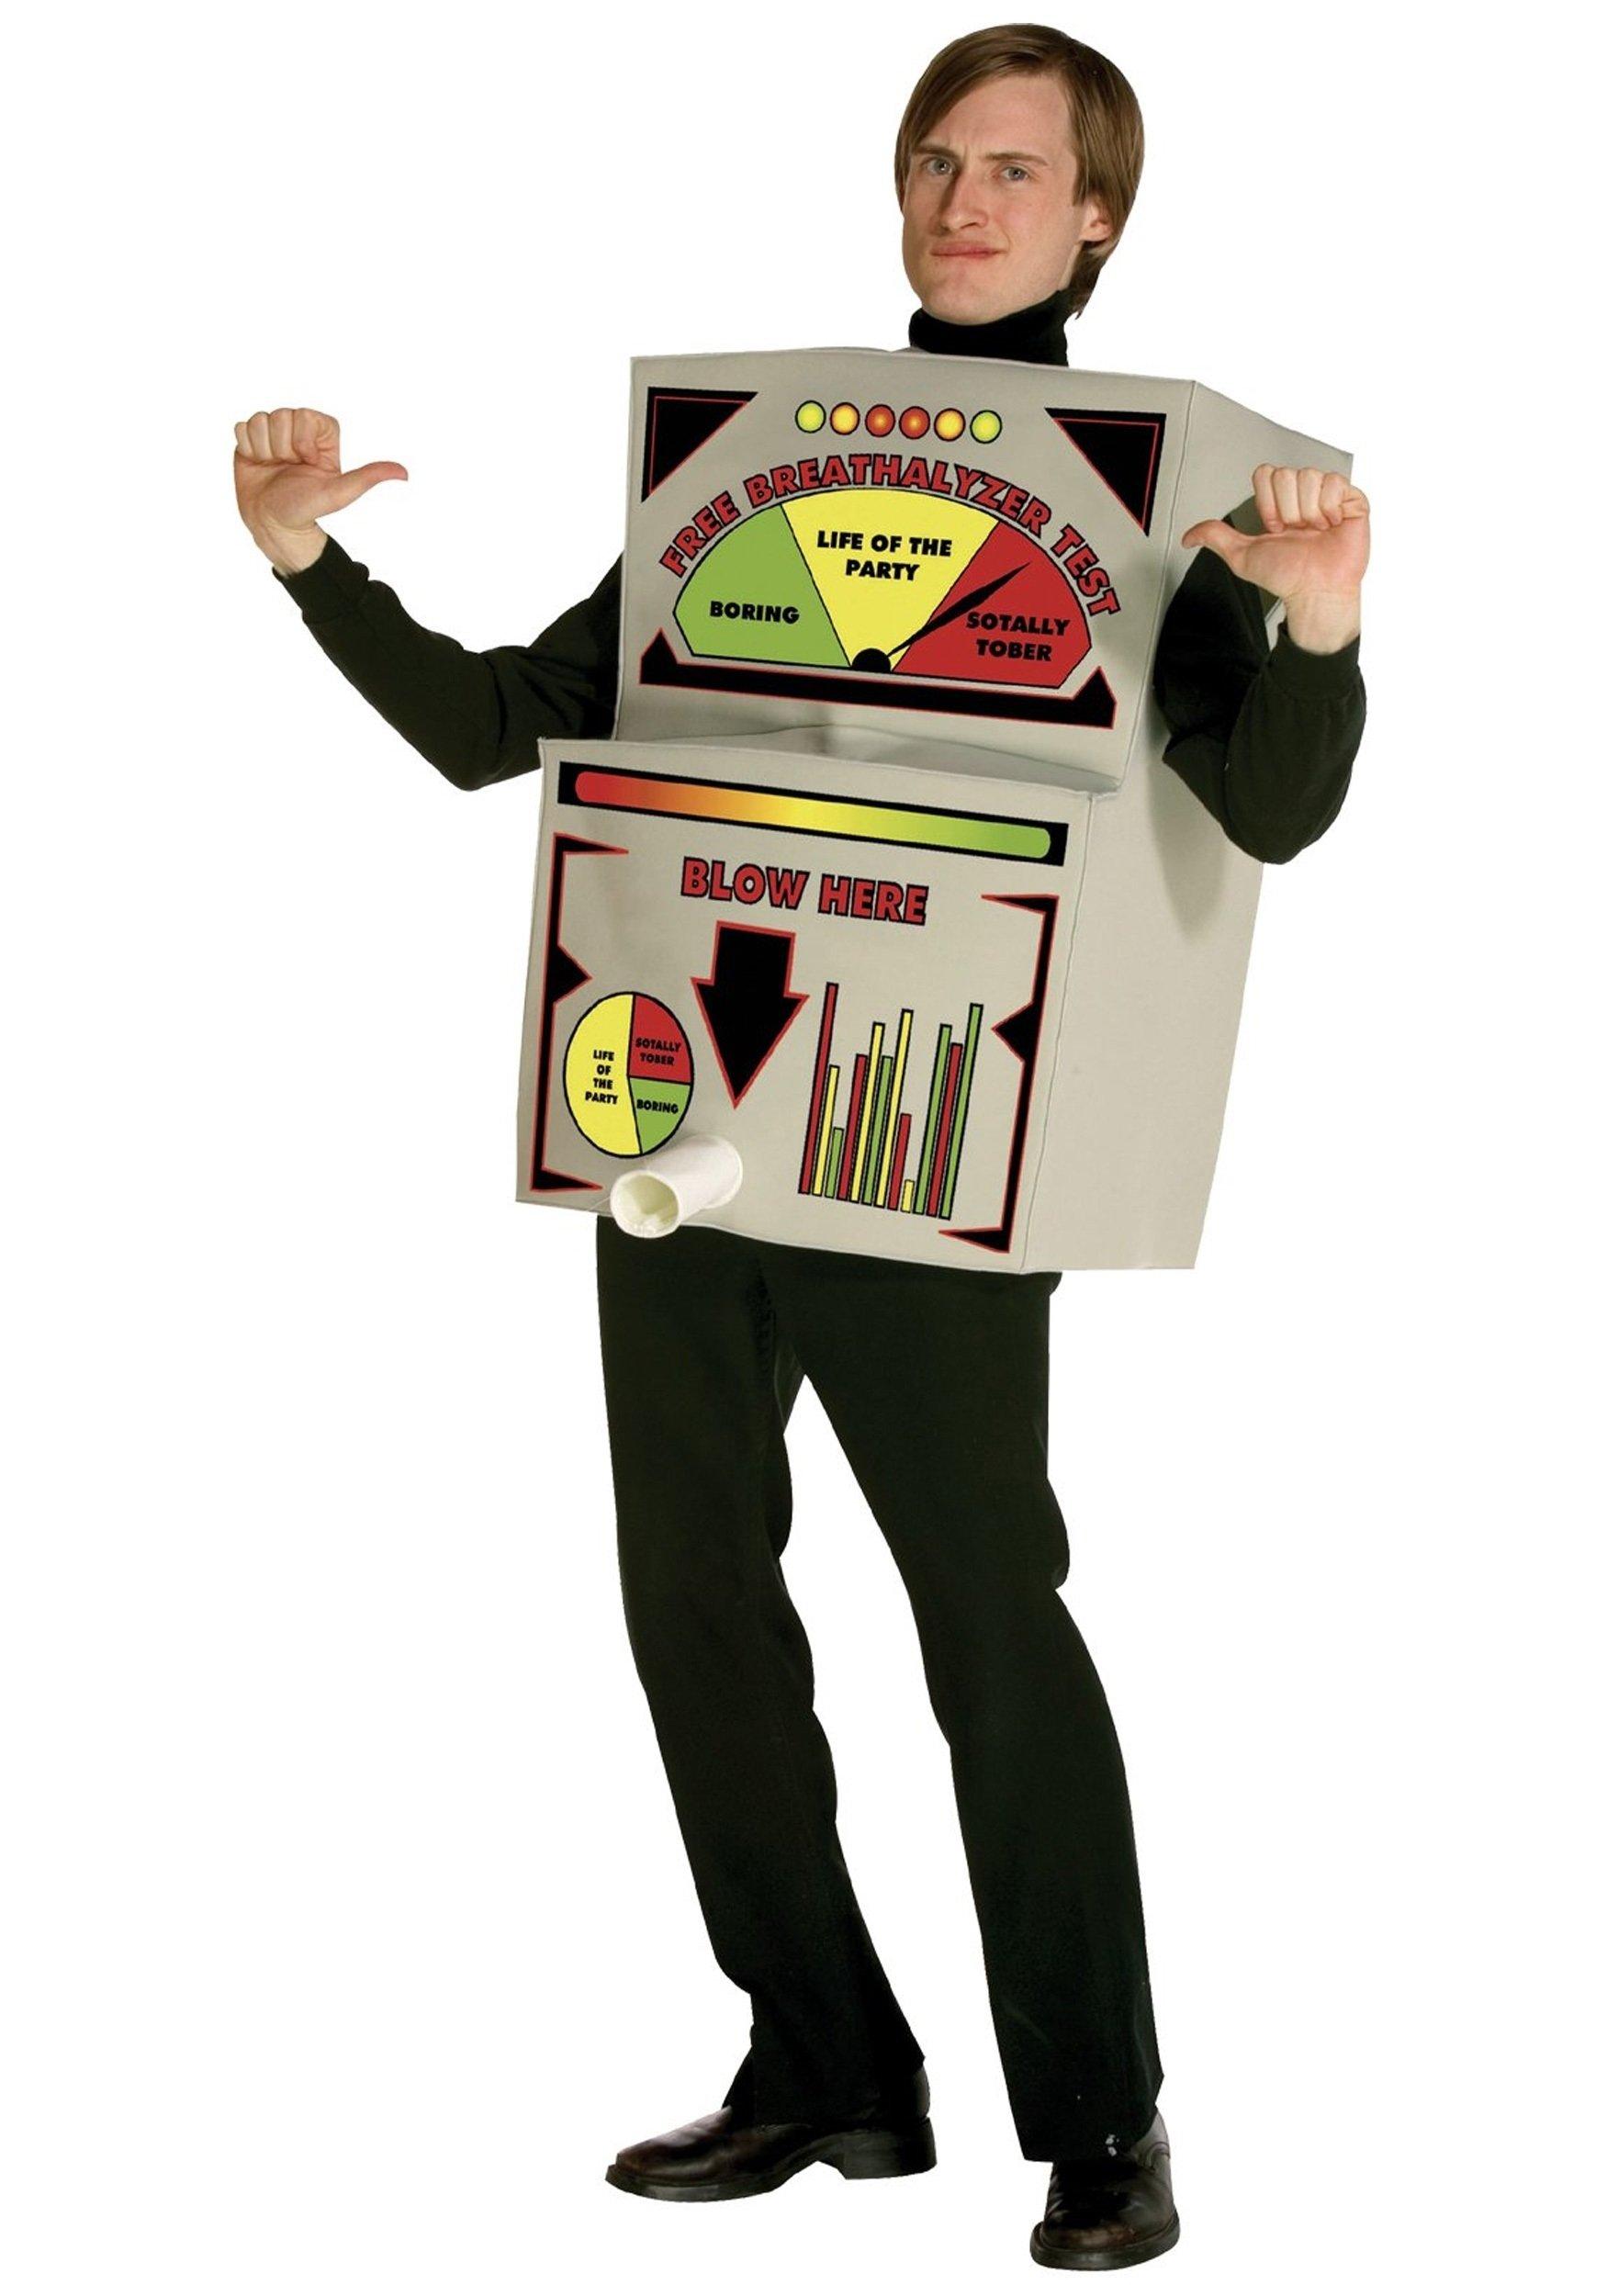 10 Stunning Cool Costume Ideas For Men breathalyzer costume funny halloween costume ideas for men 9 2020